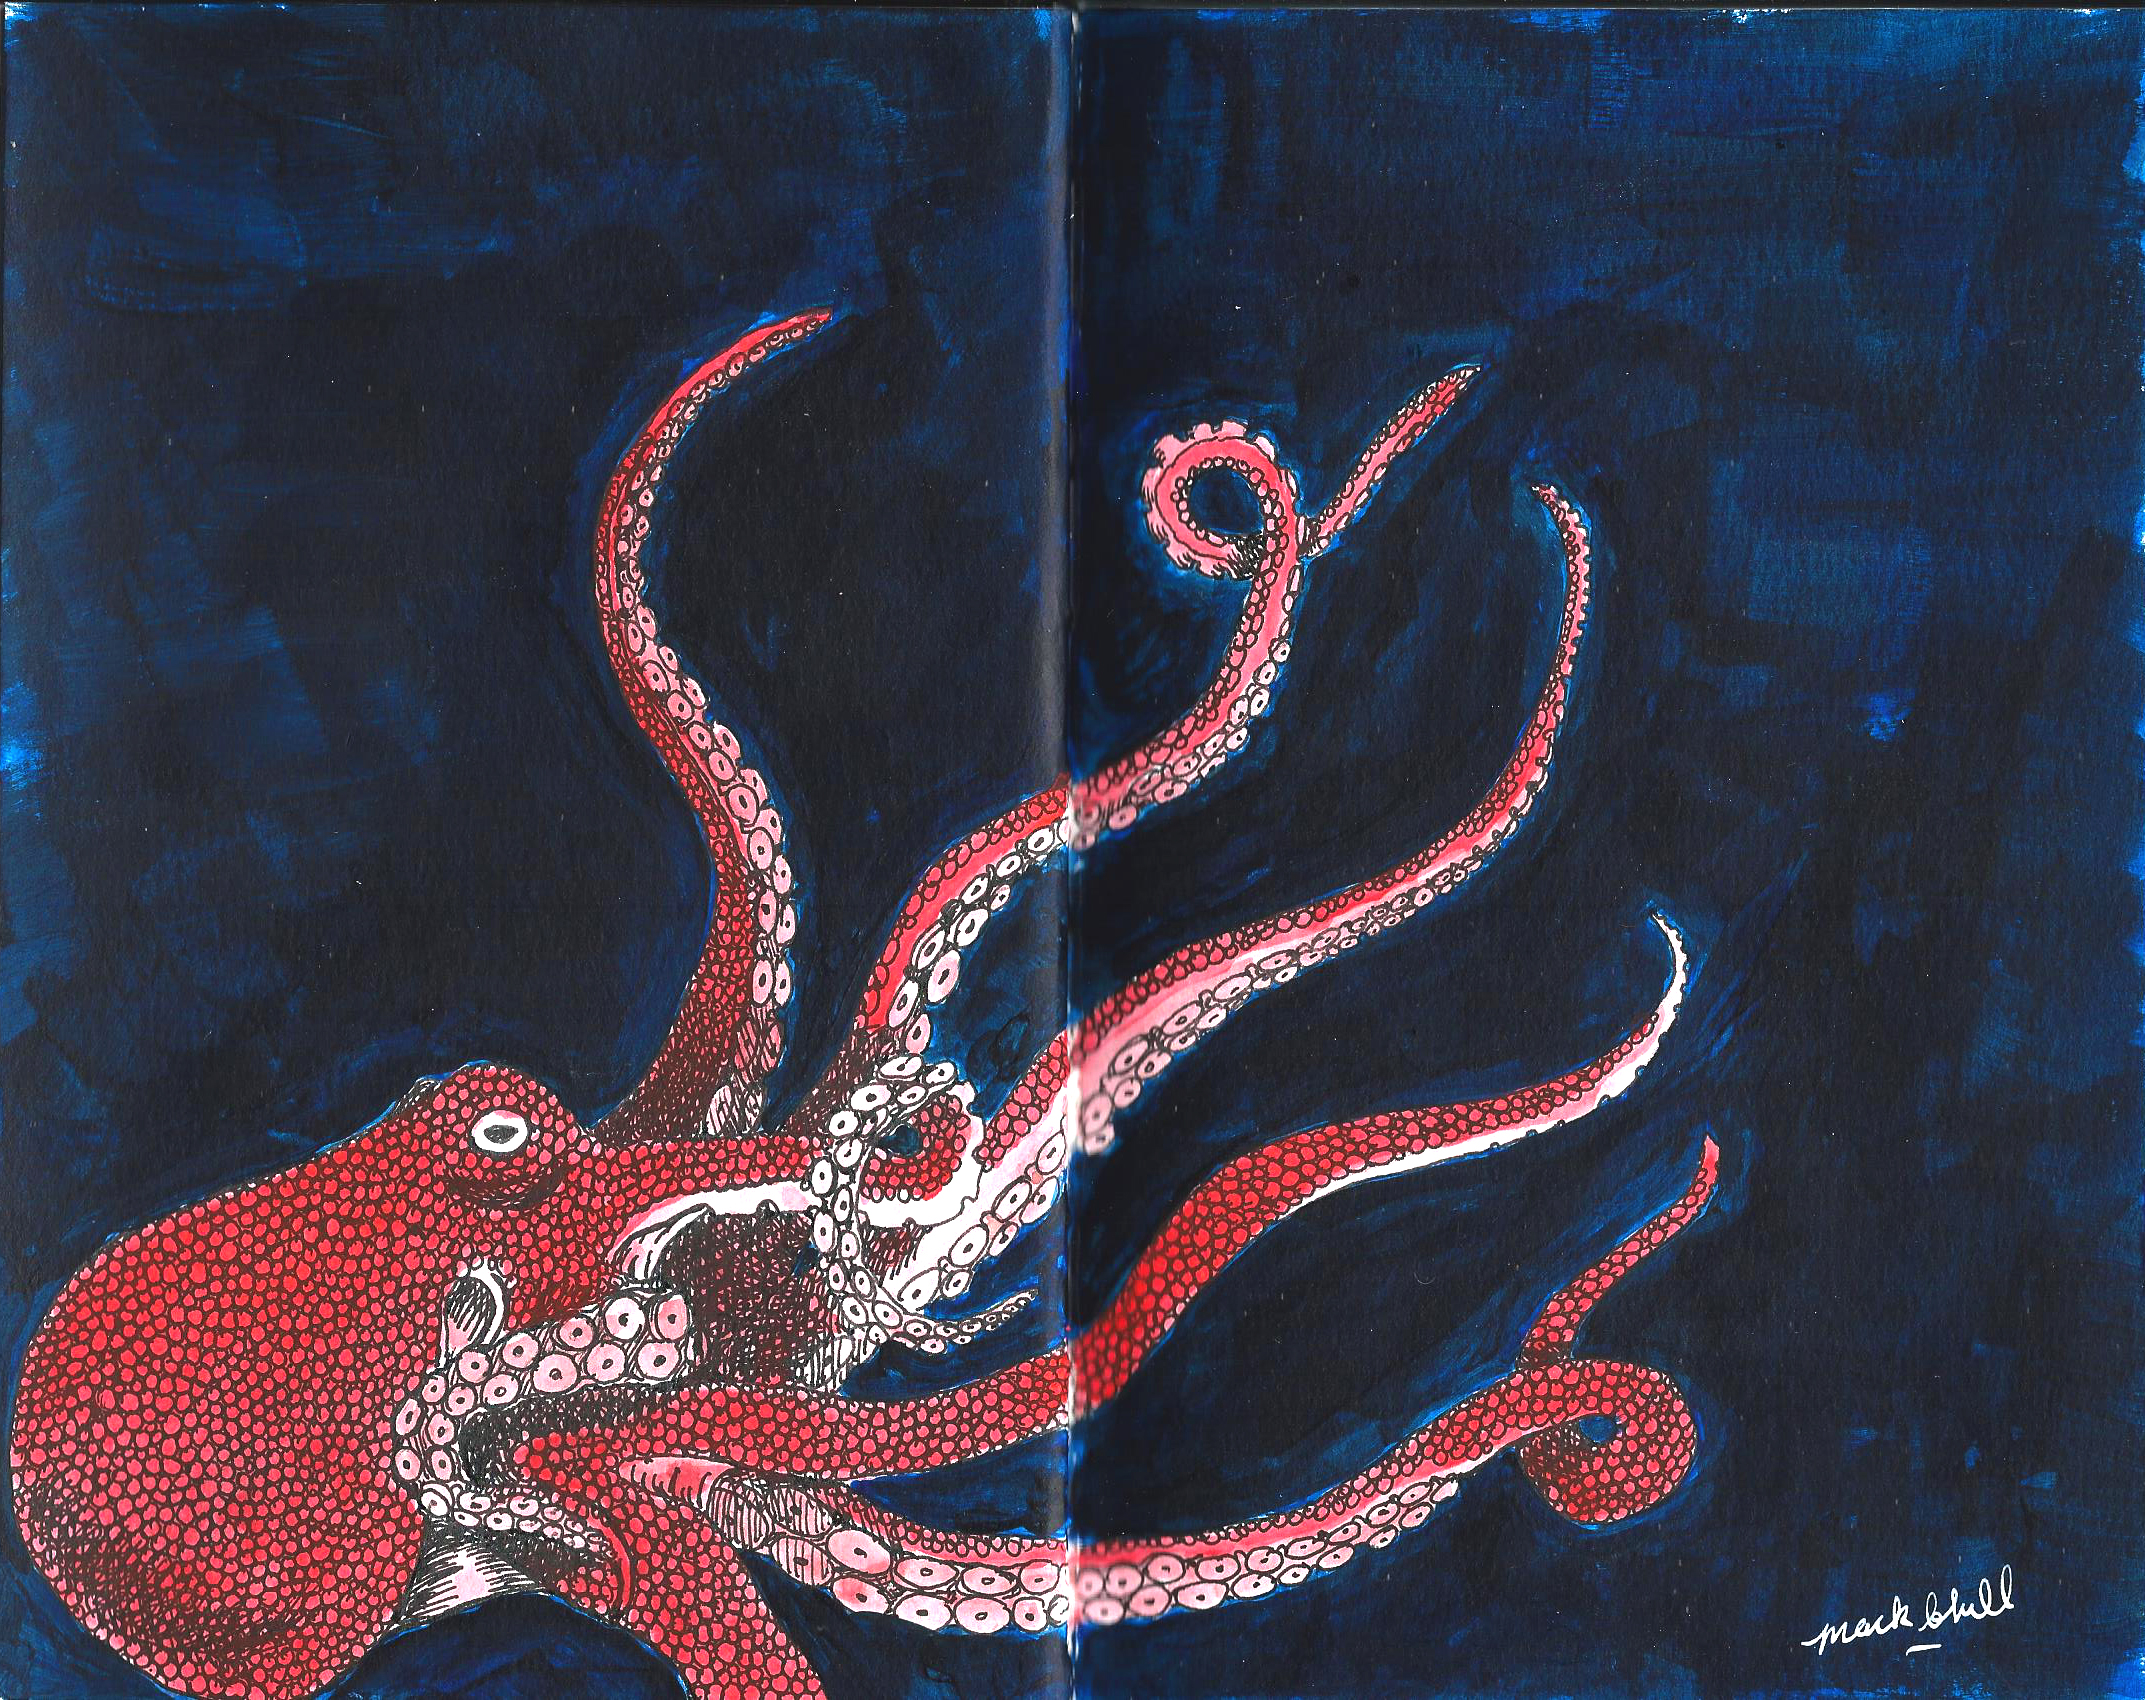 <b>A Red Octopus</b>